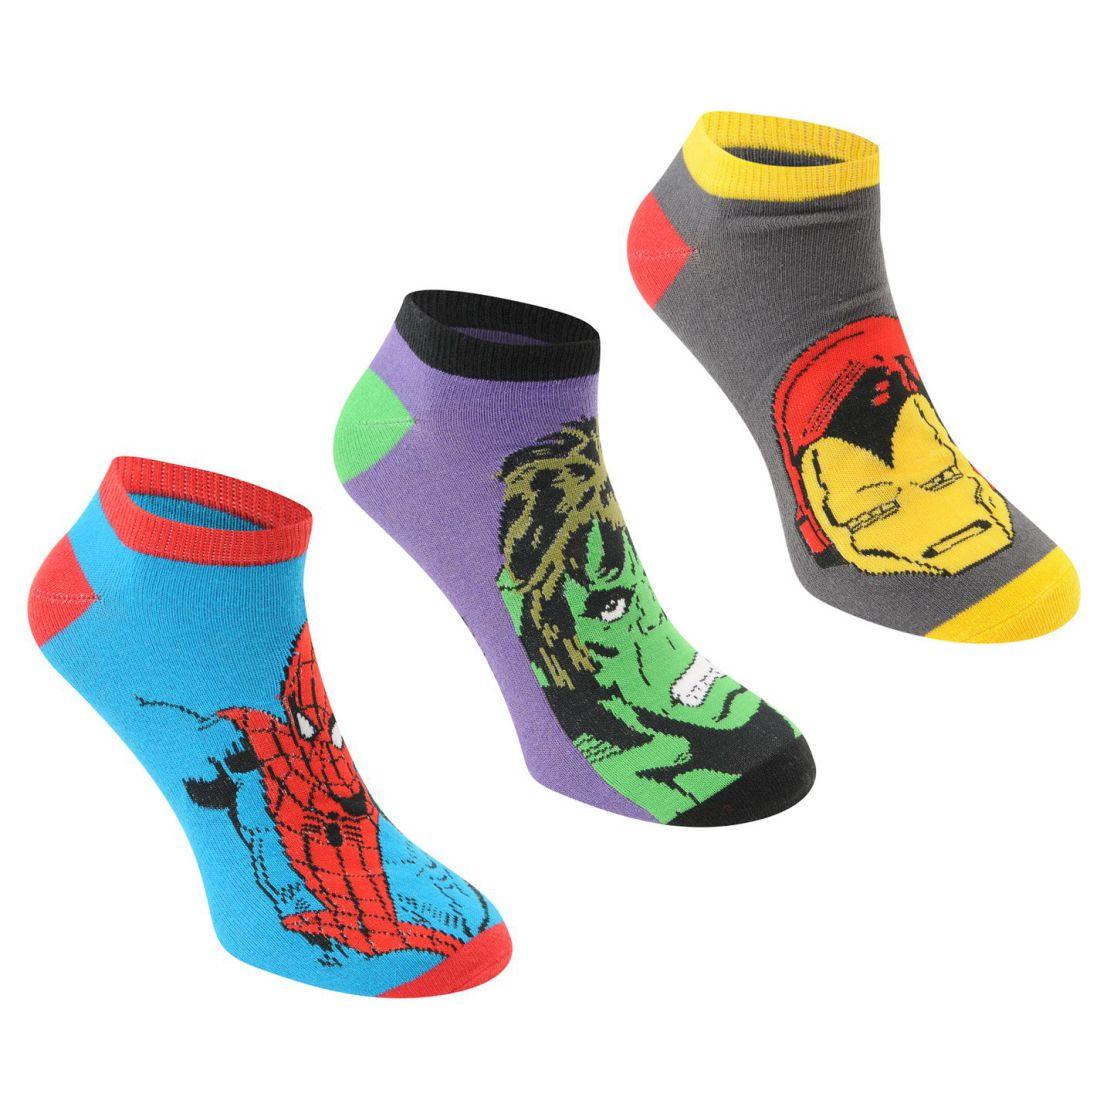 c6e07fa7c9f Character Kids Socks Children Warm Winter Accessories New